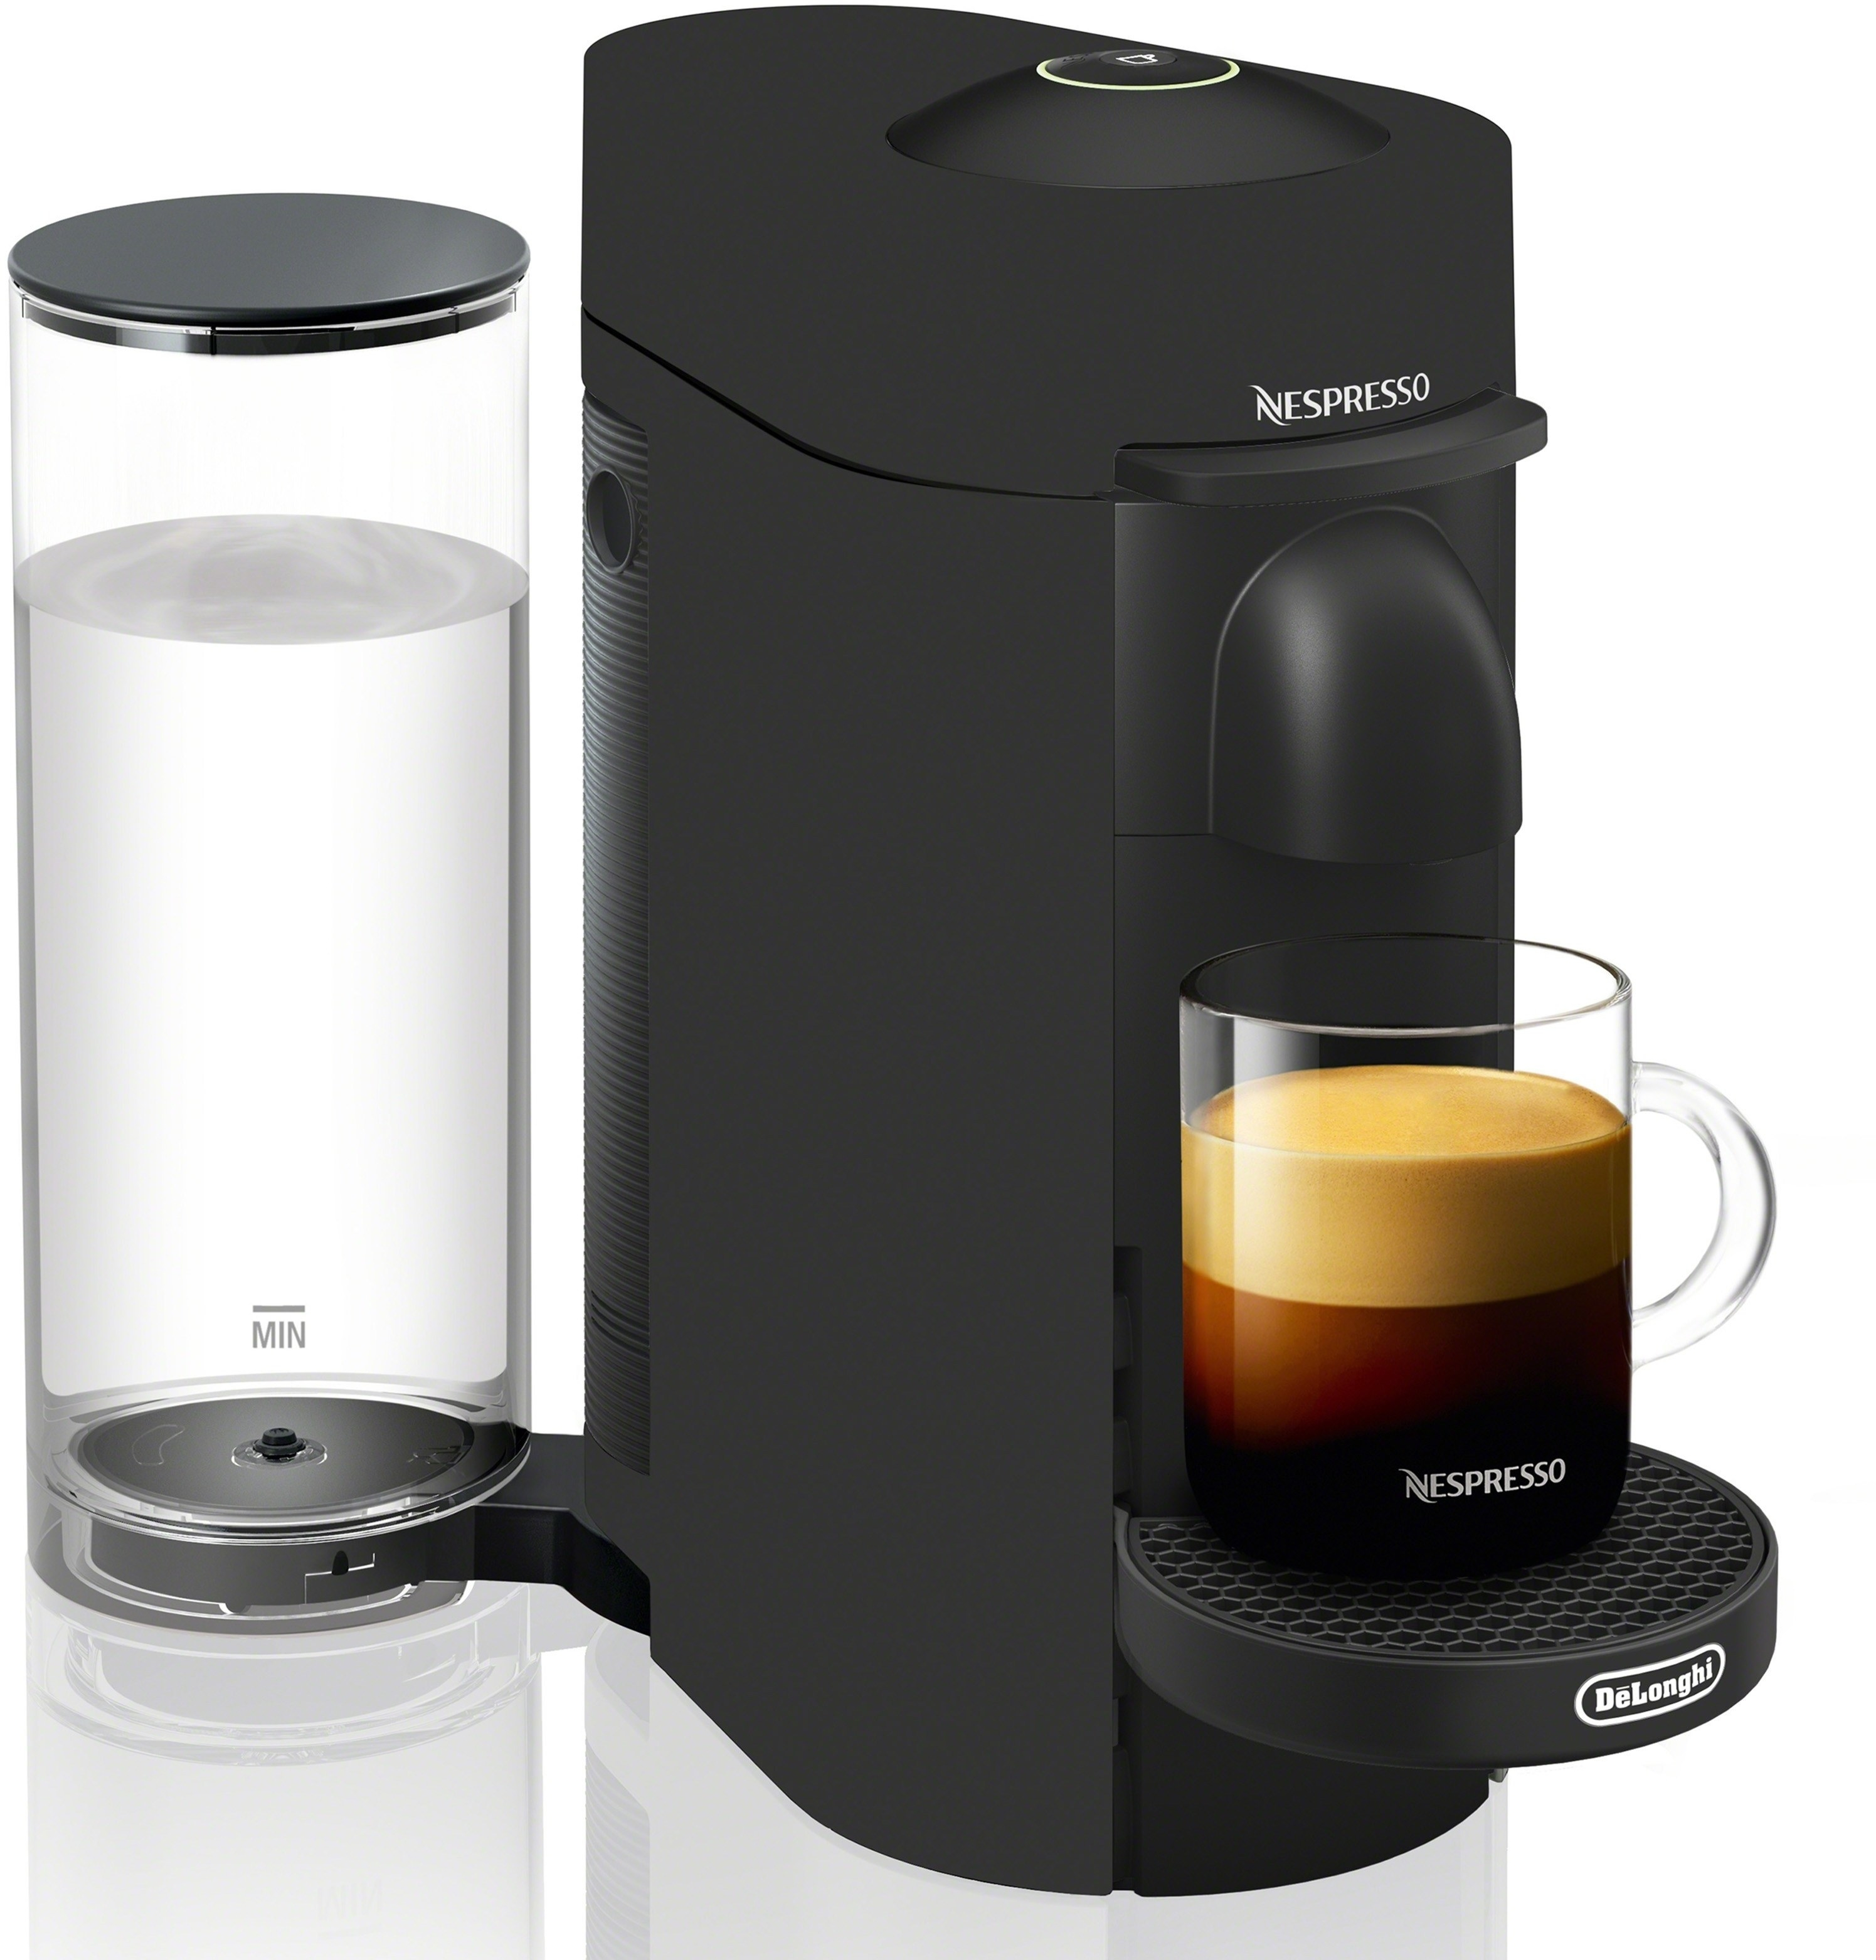 a black nespresso coffee machine